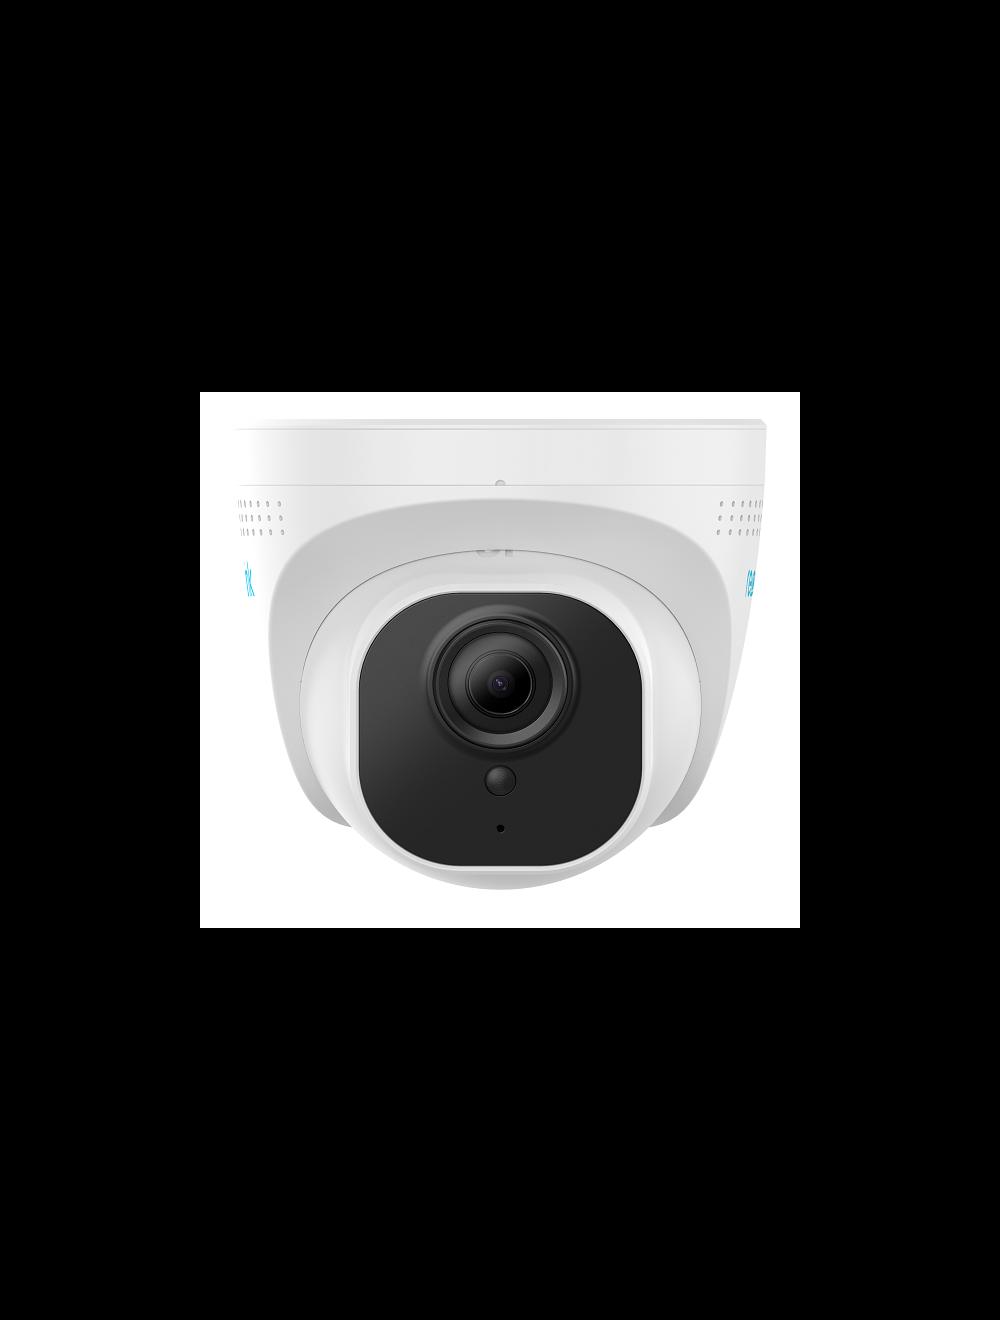 Reolink RLC-520A | 5 Megapixel | POE | Slimme Detectie |